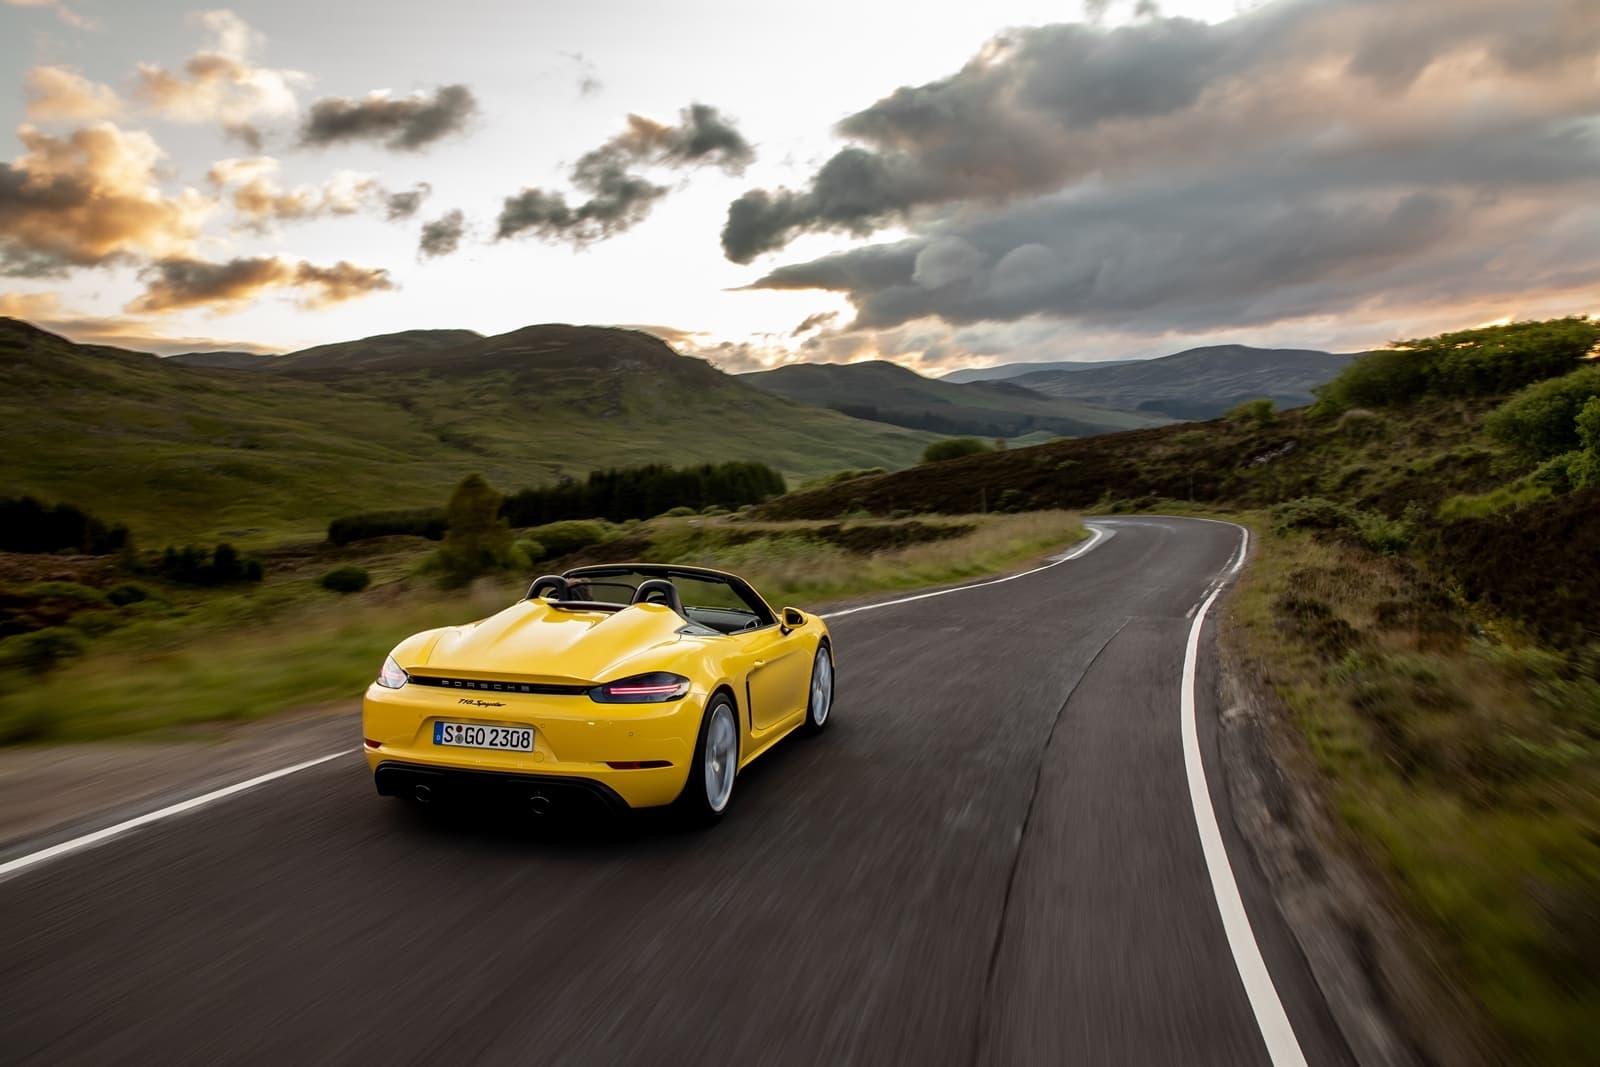 Porsche 718 Spyder 0719 127